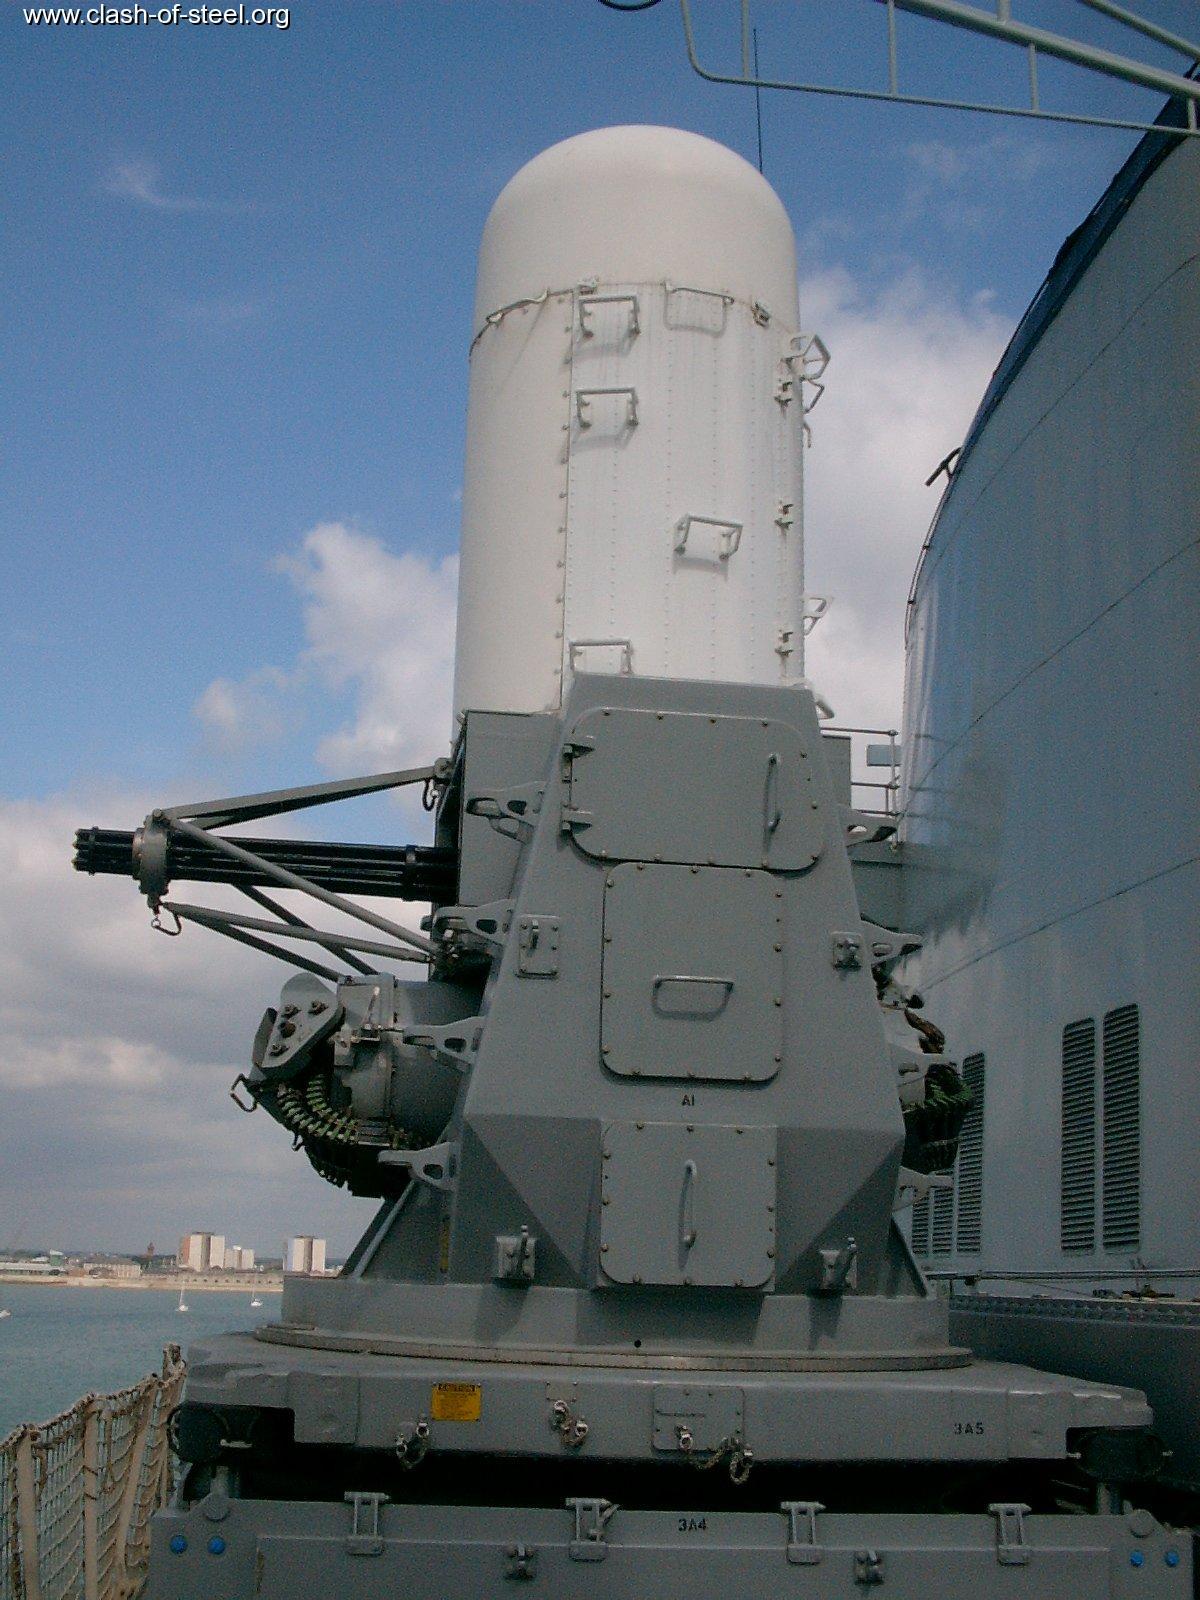 Royal Gate Dodge >> Clash of Steel, Image gallery - Ark Royal, Anti-ship ...